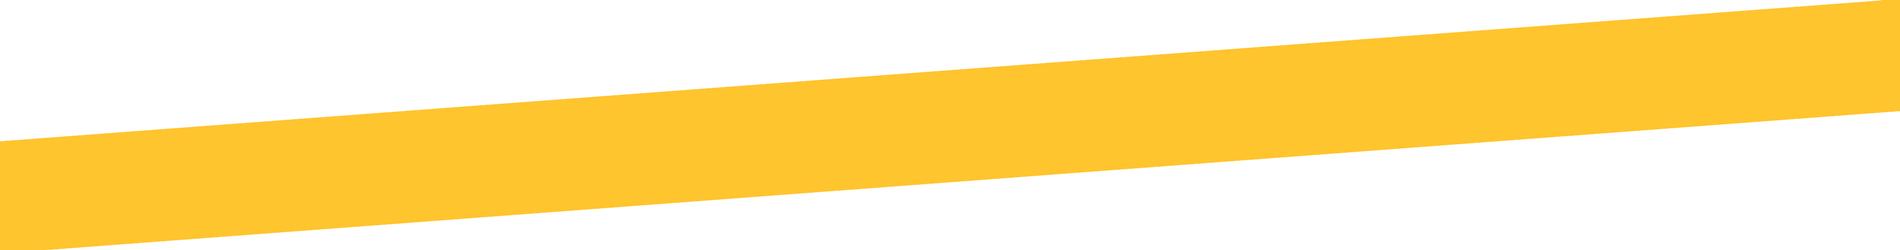 divider galben diagonala in sus1